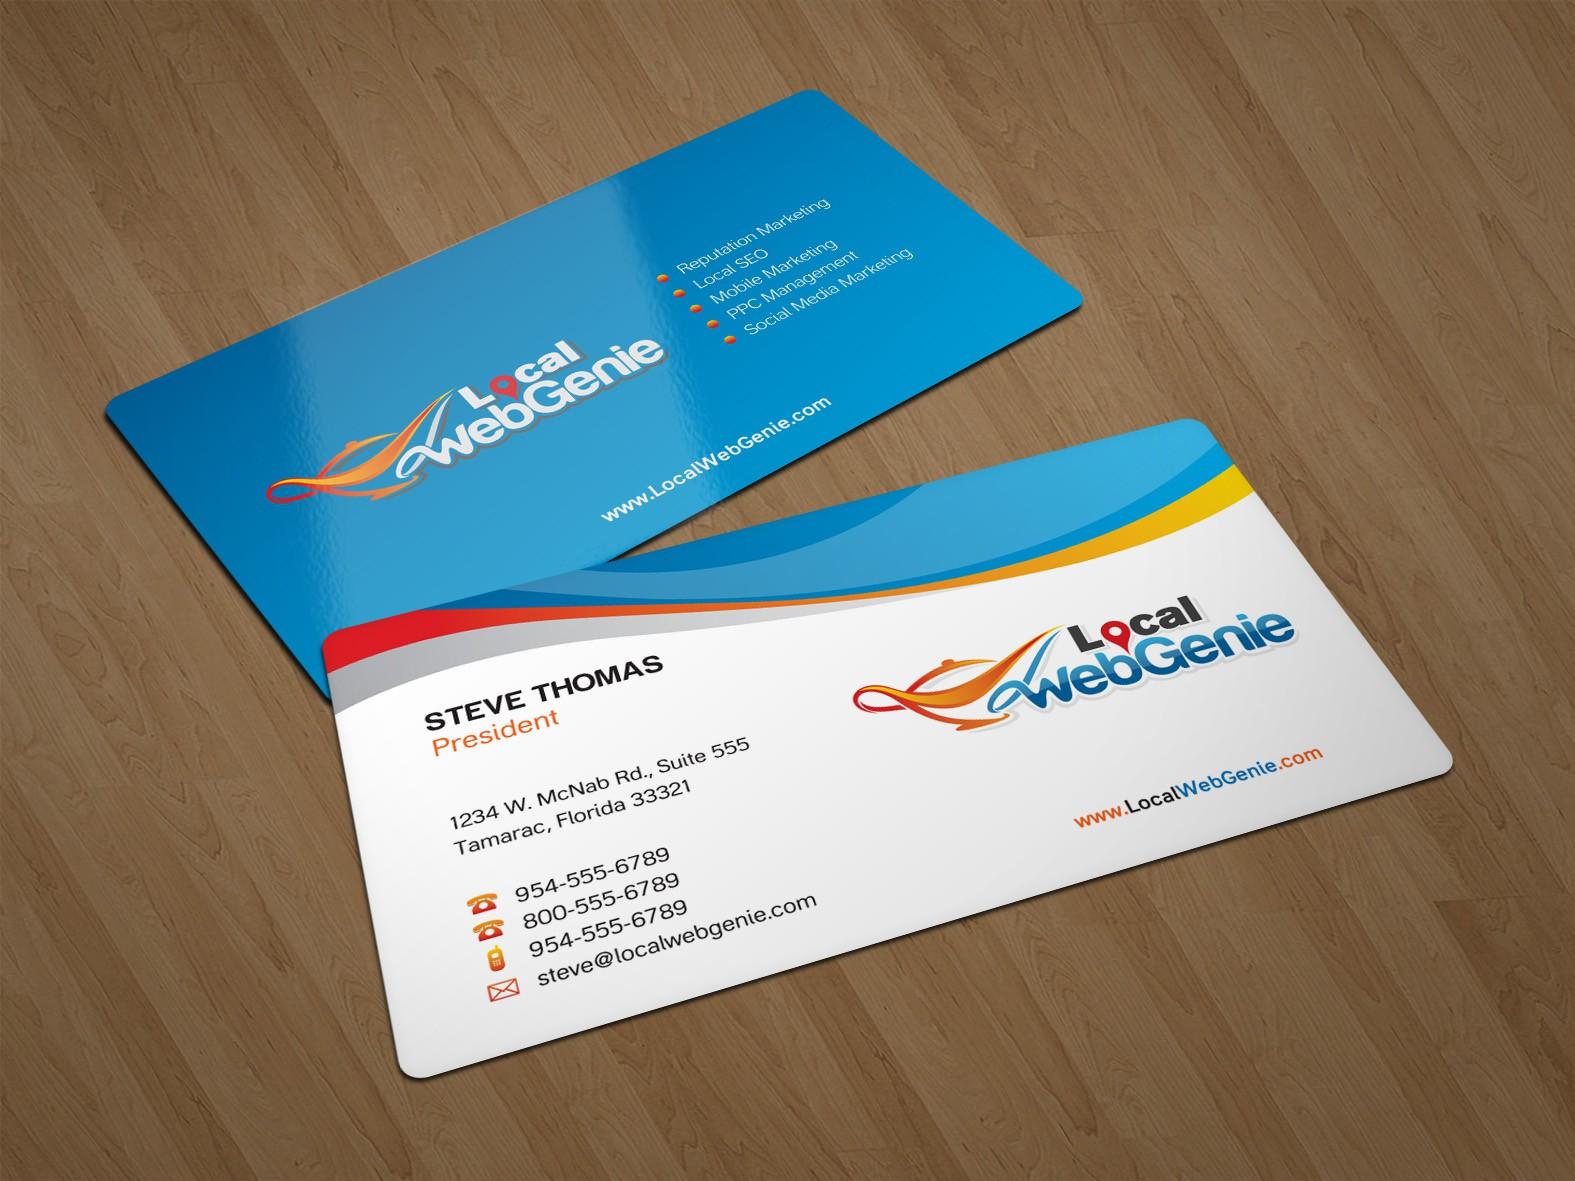 Local WebGenie Needs New Cards & Letterhead